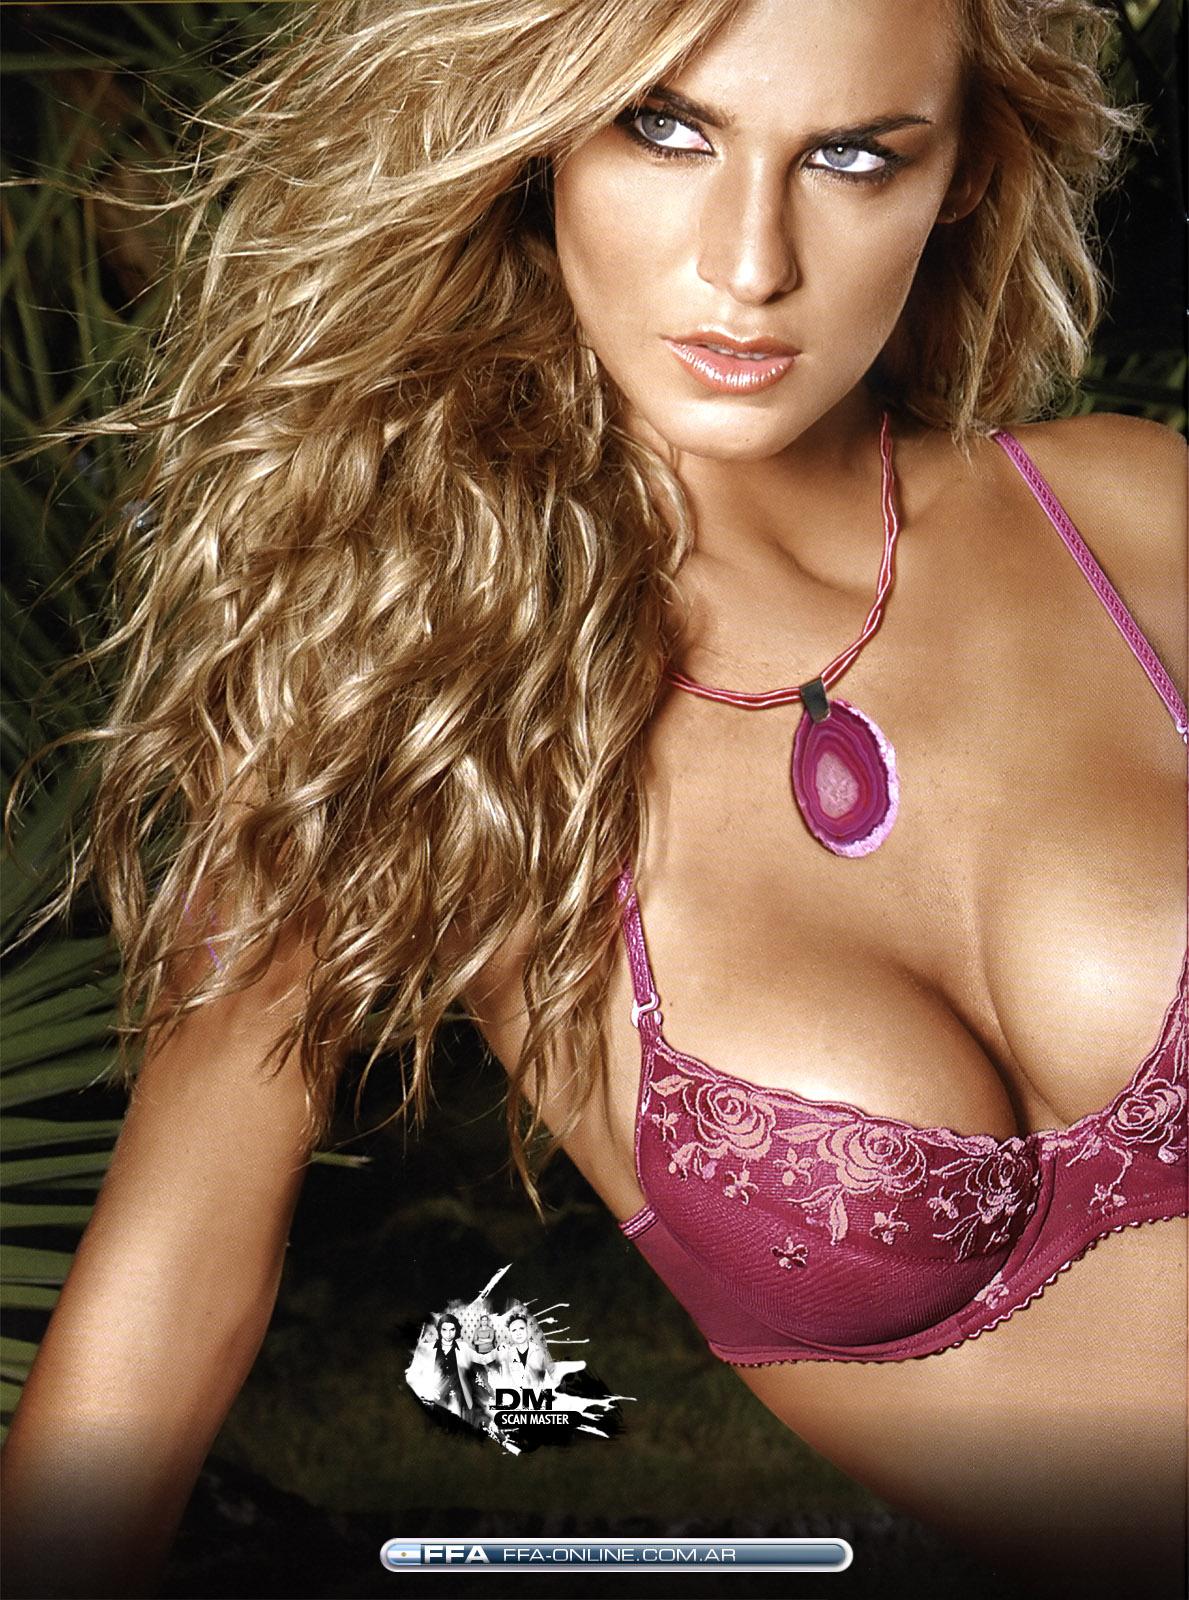 Sabrina Rojas in lingerie